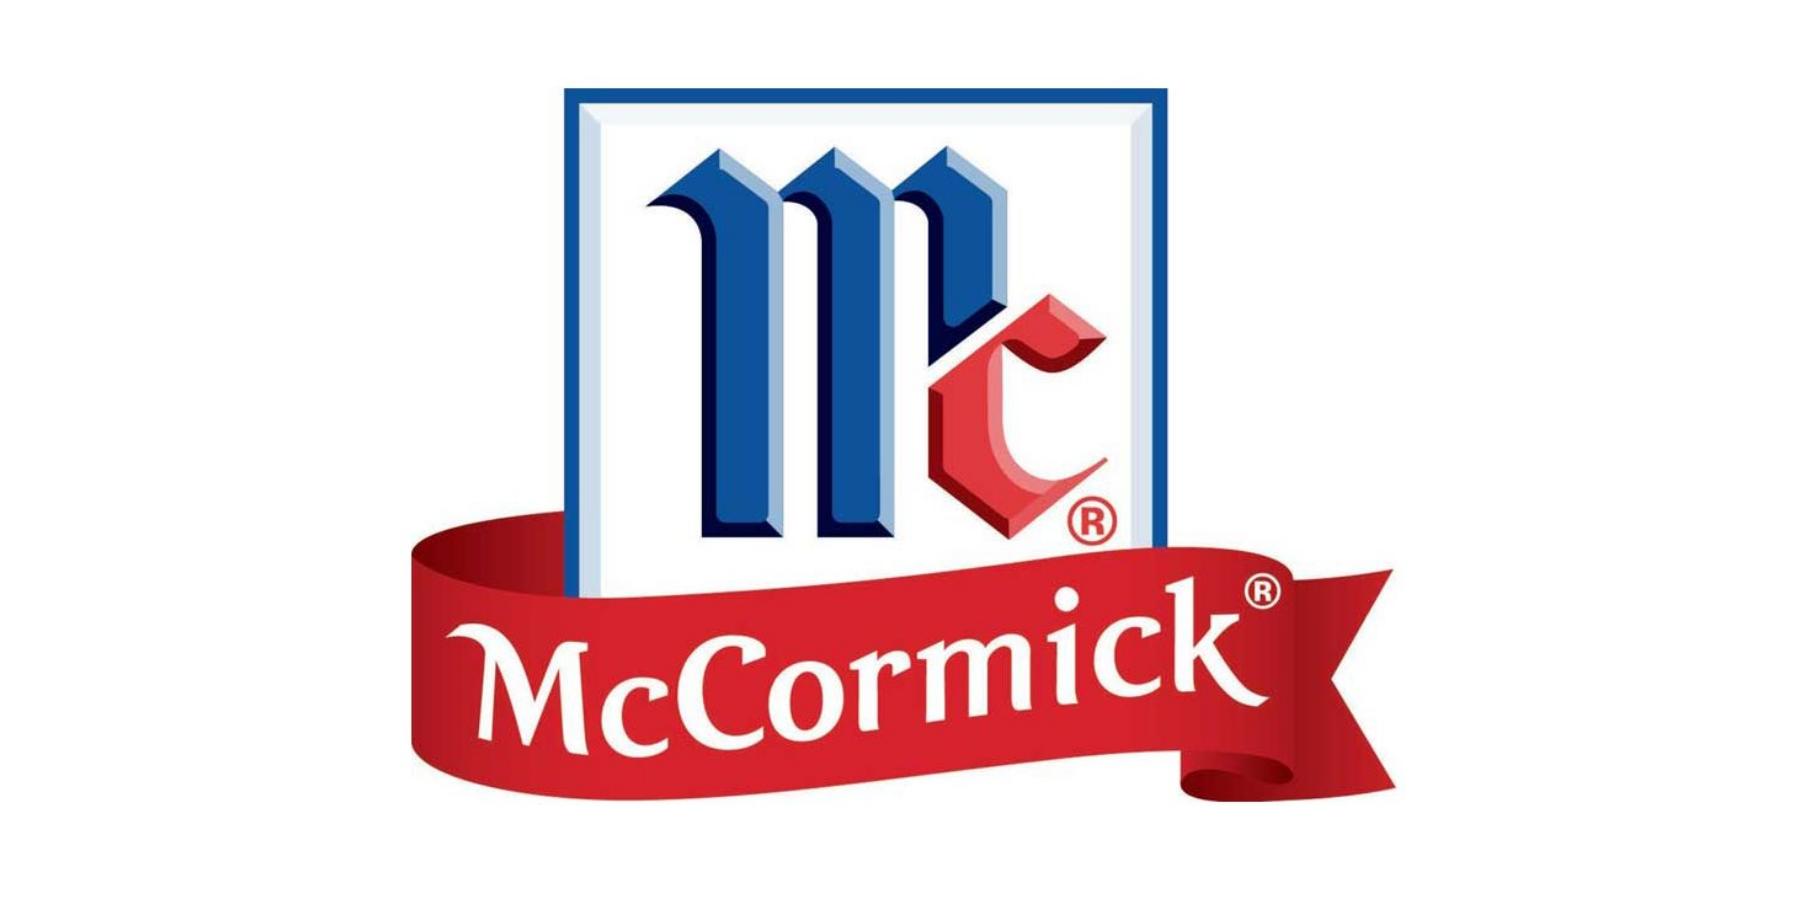 McCormick Spice Brand